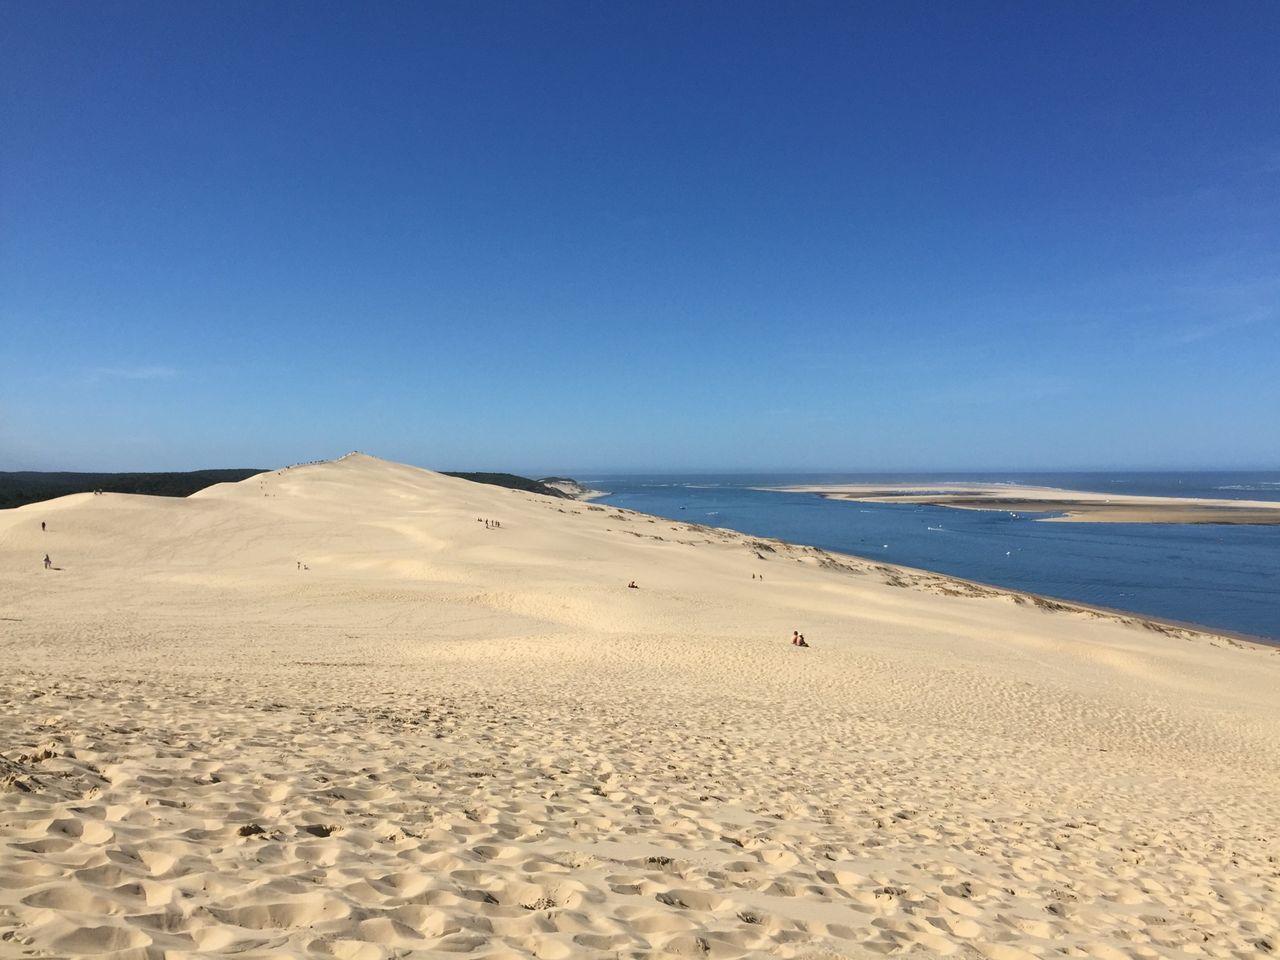 Scenic view of dune of pilat against sky